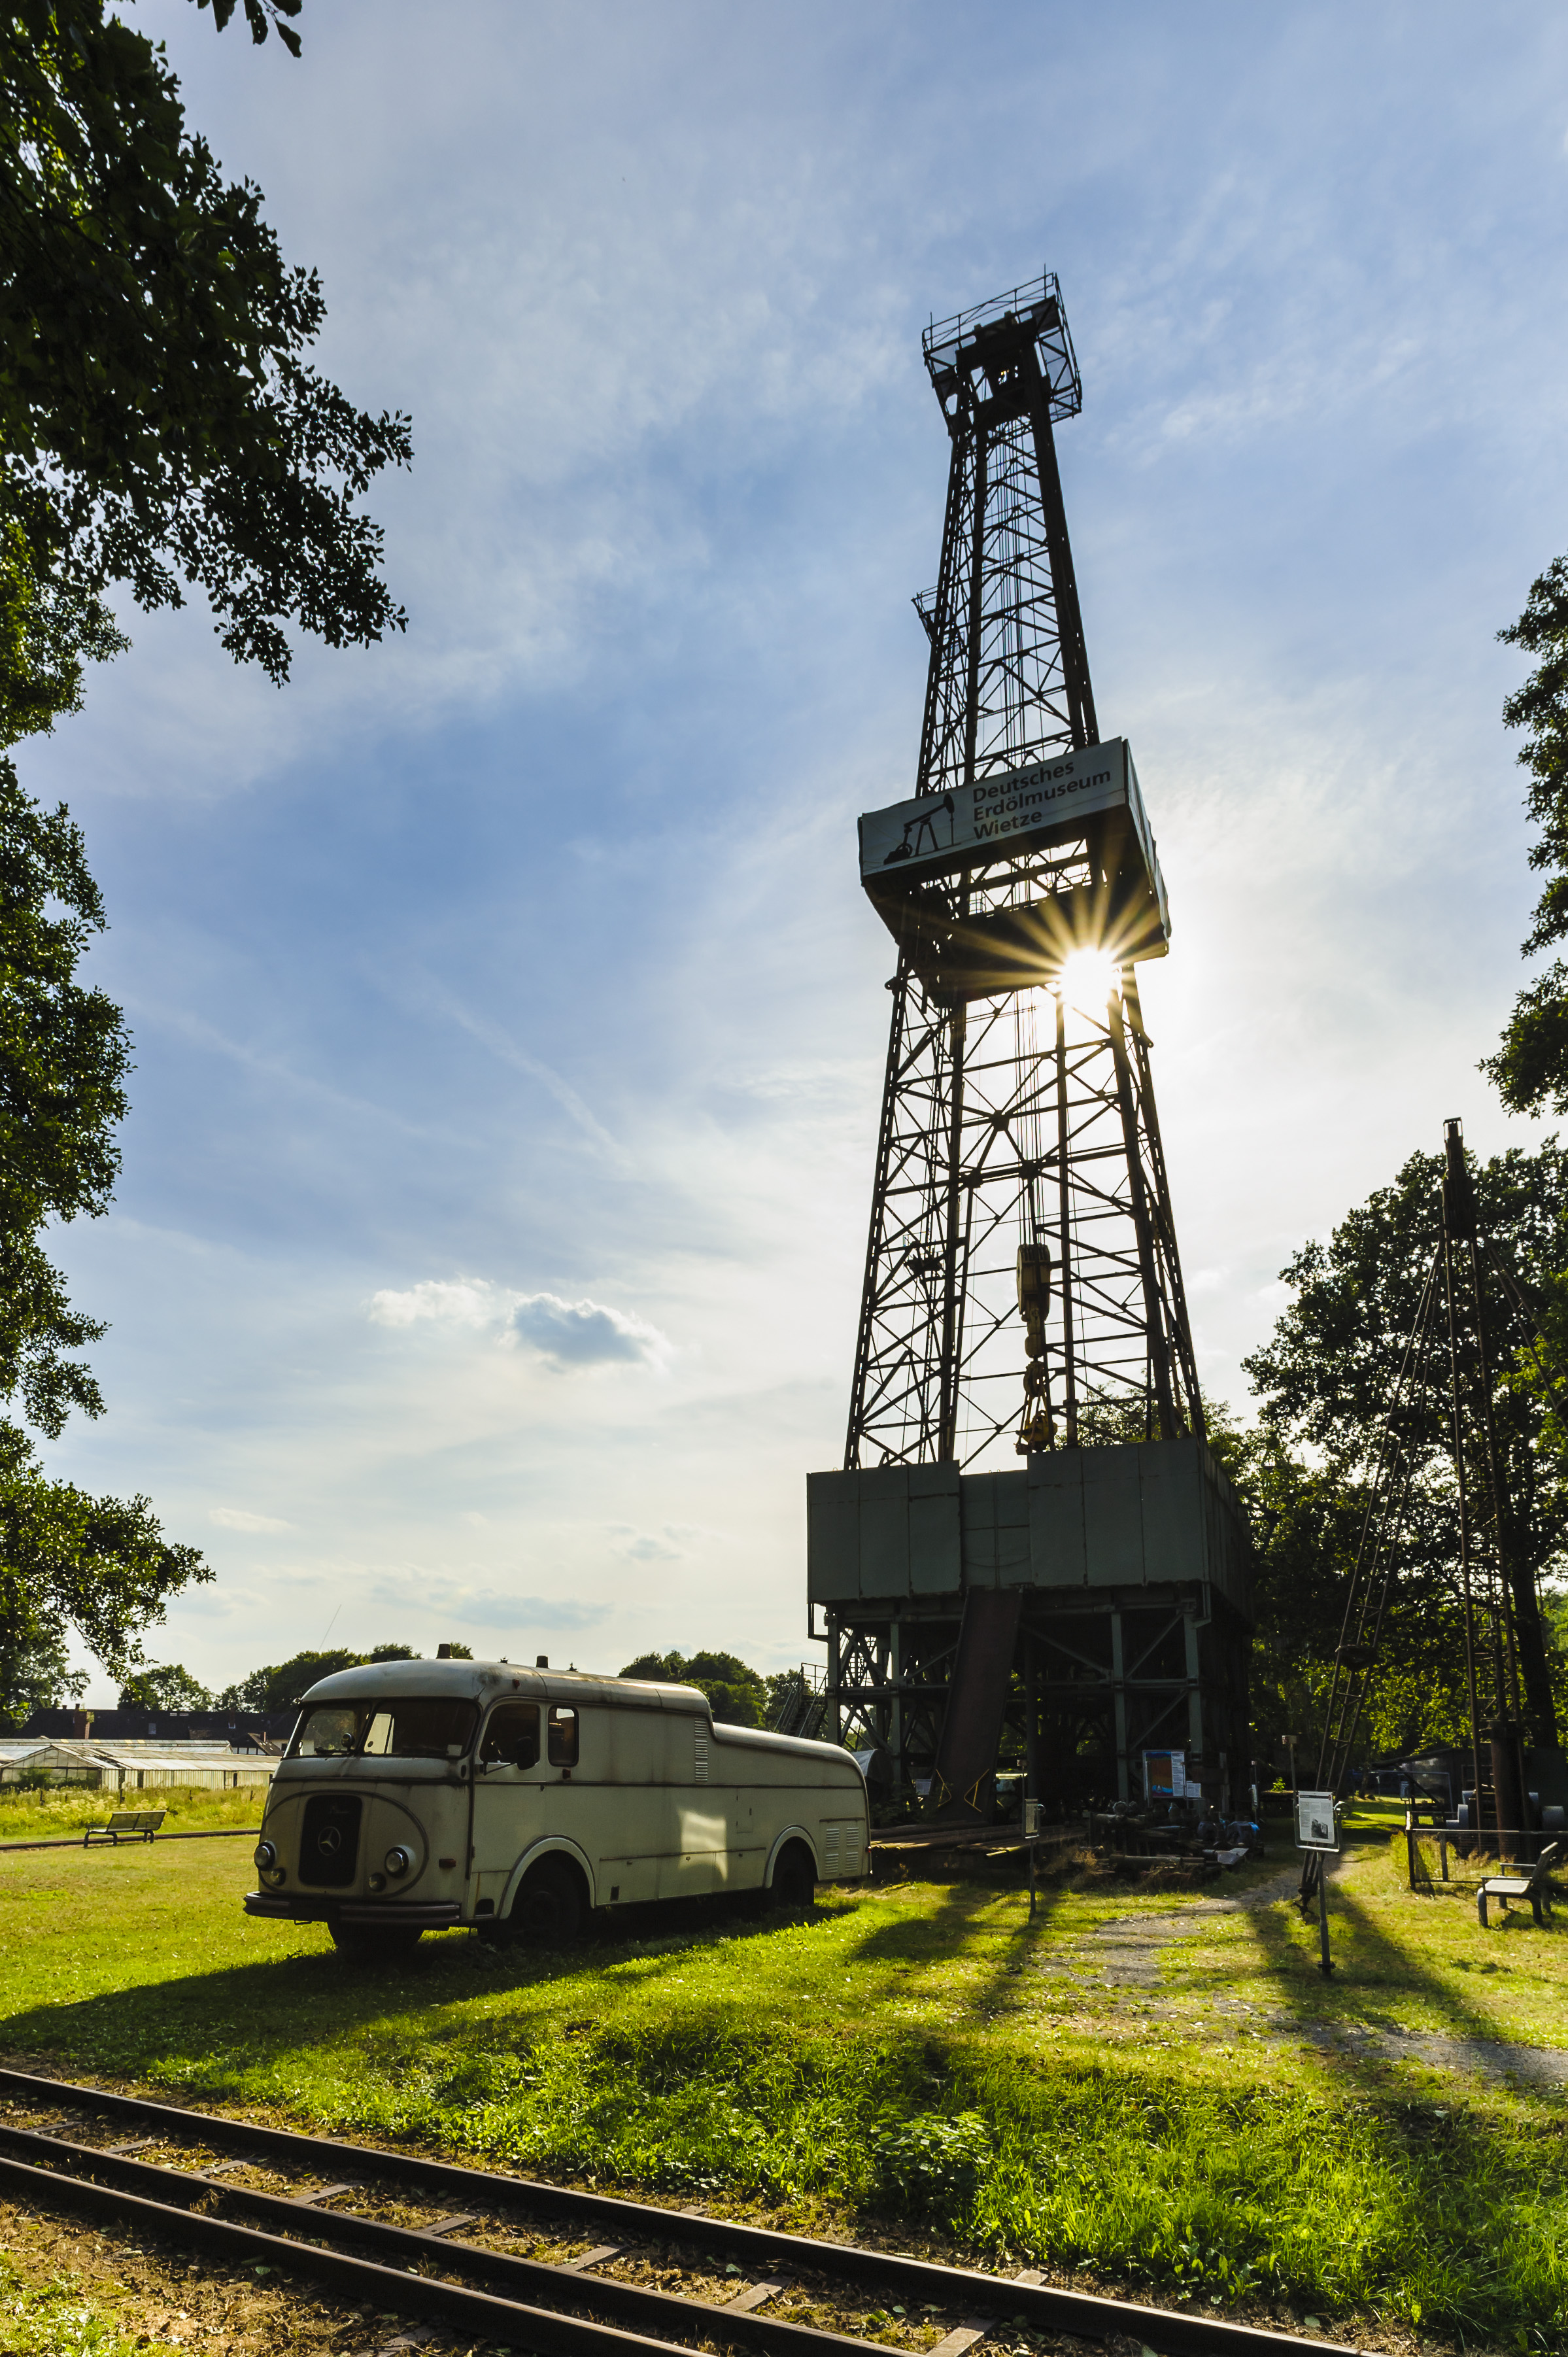 Wietze Bohrturm Erdölmuseum